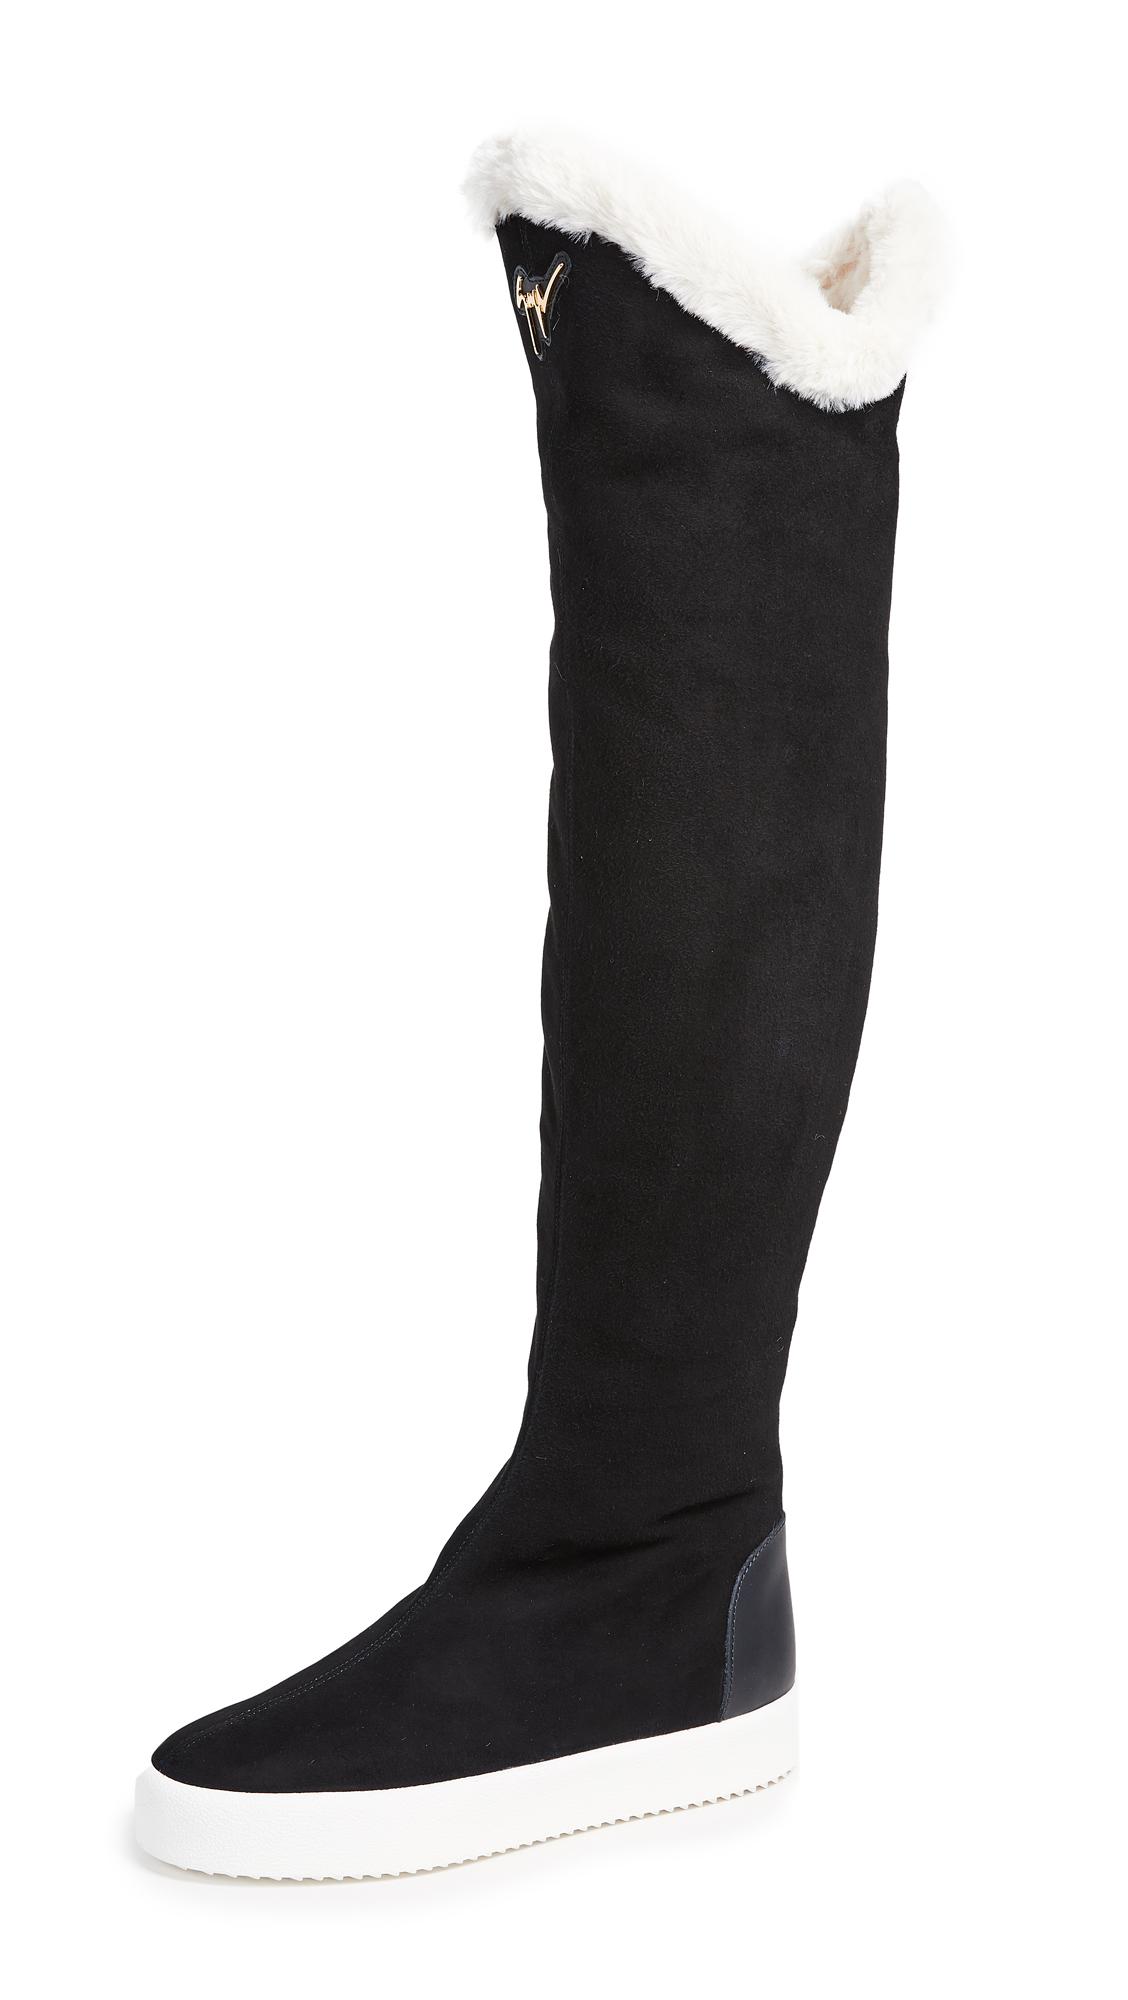 Giuseppe Zanotti Thigh High Boots - Nero